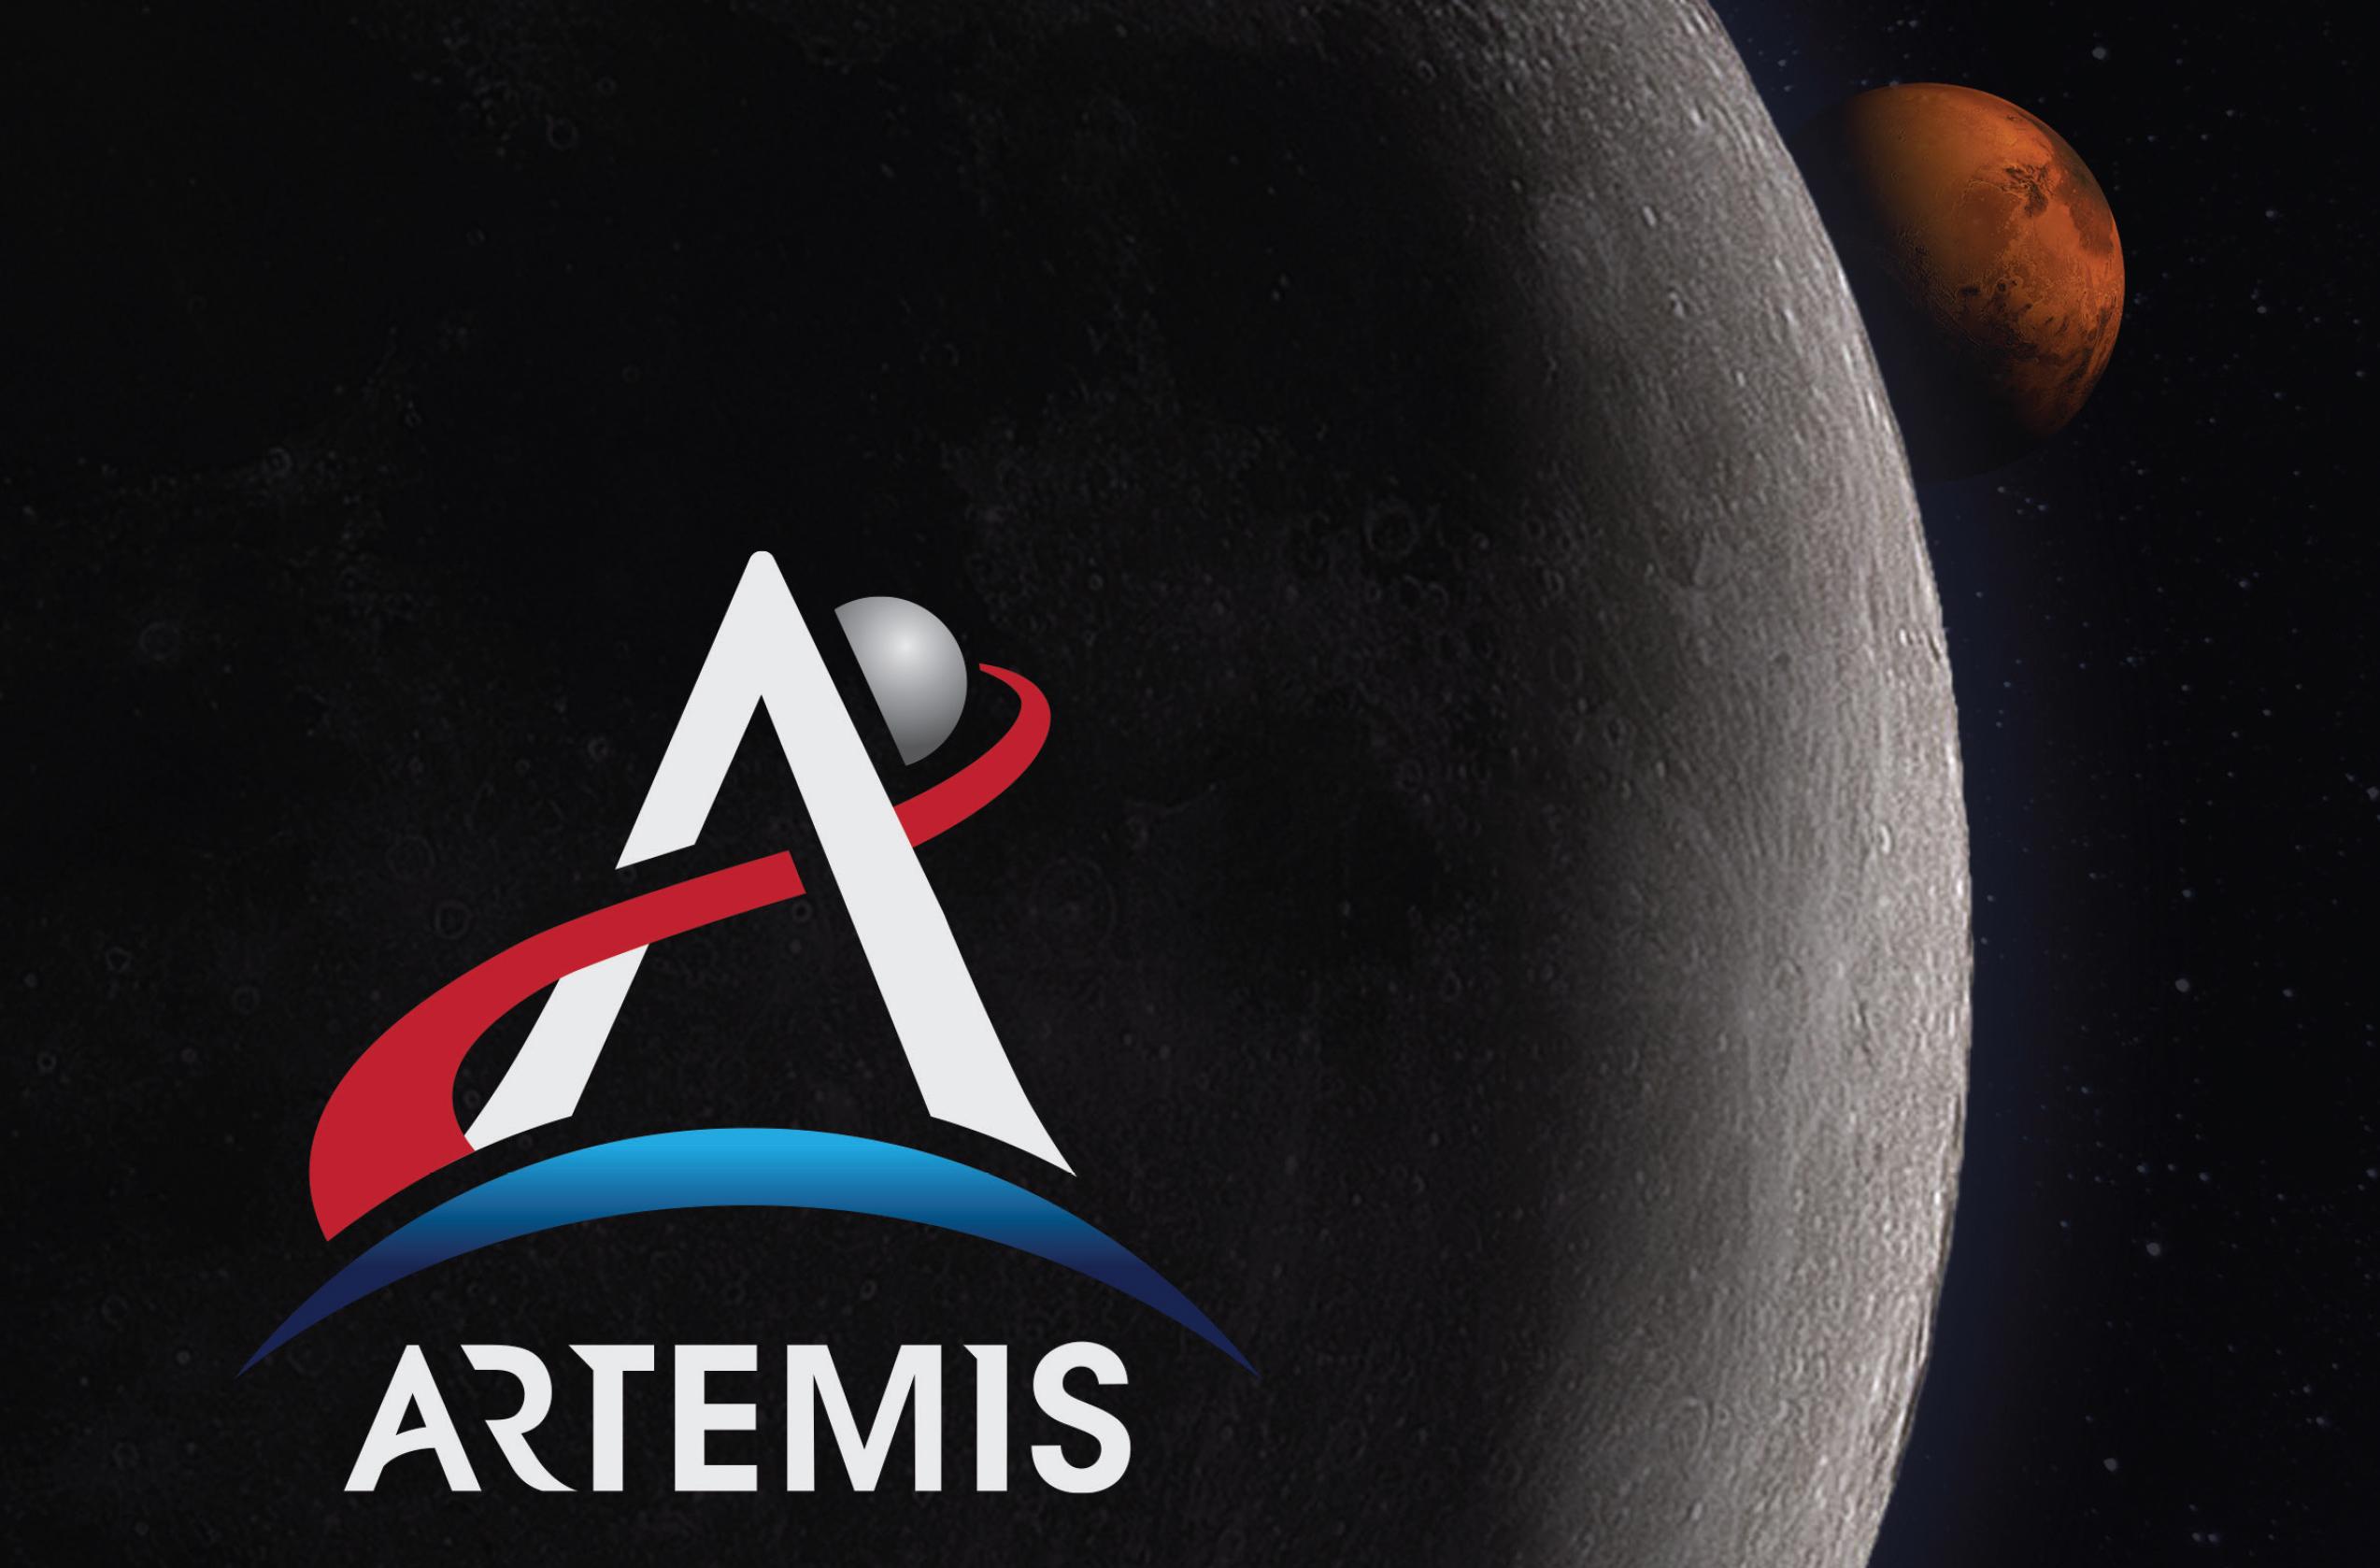 NASA Artemis: Return to the Moon